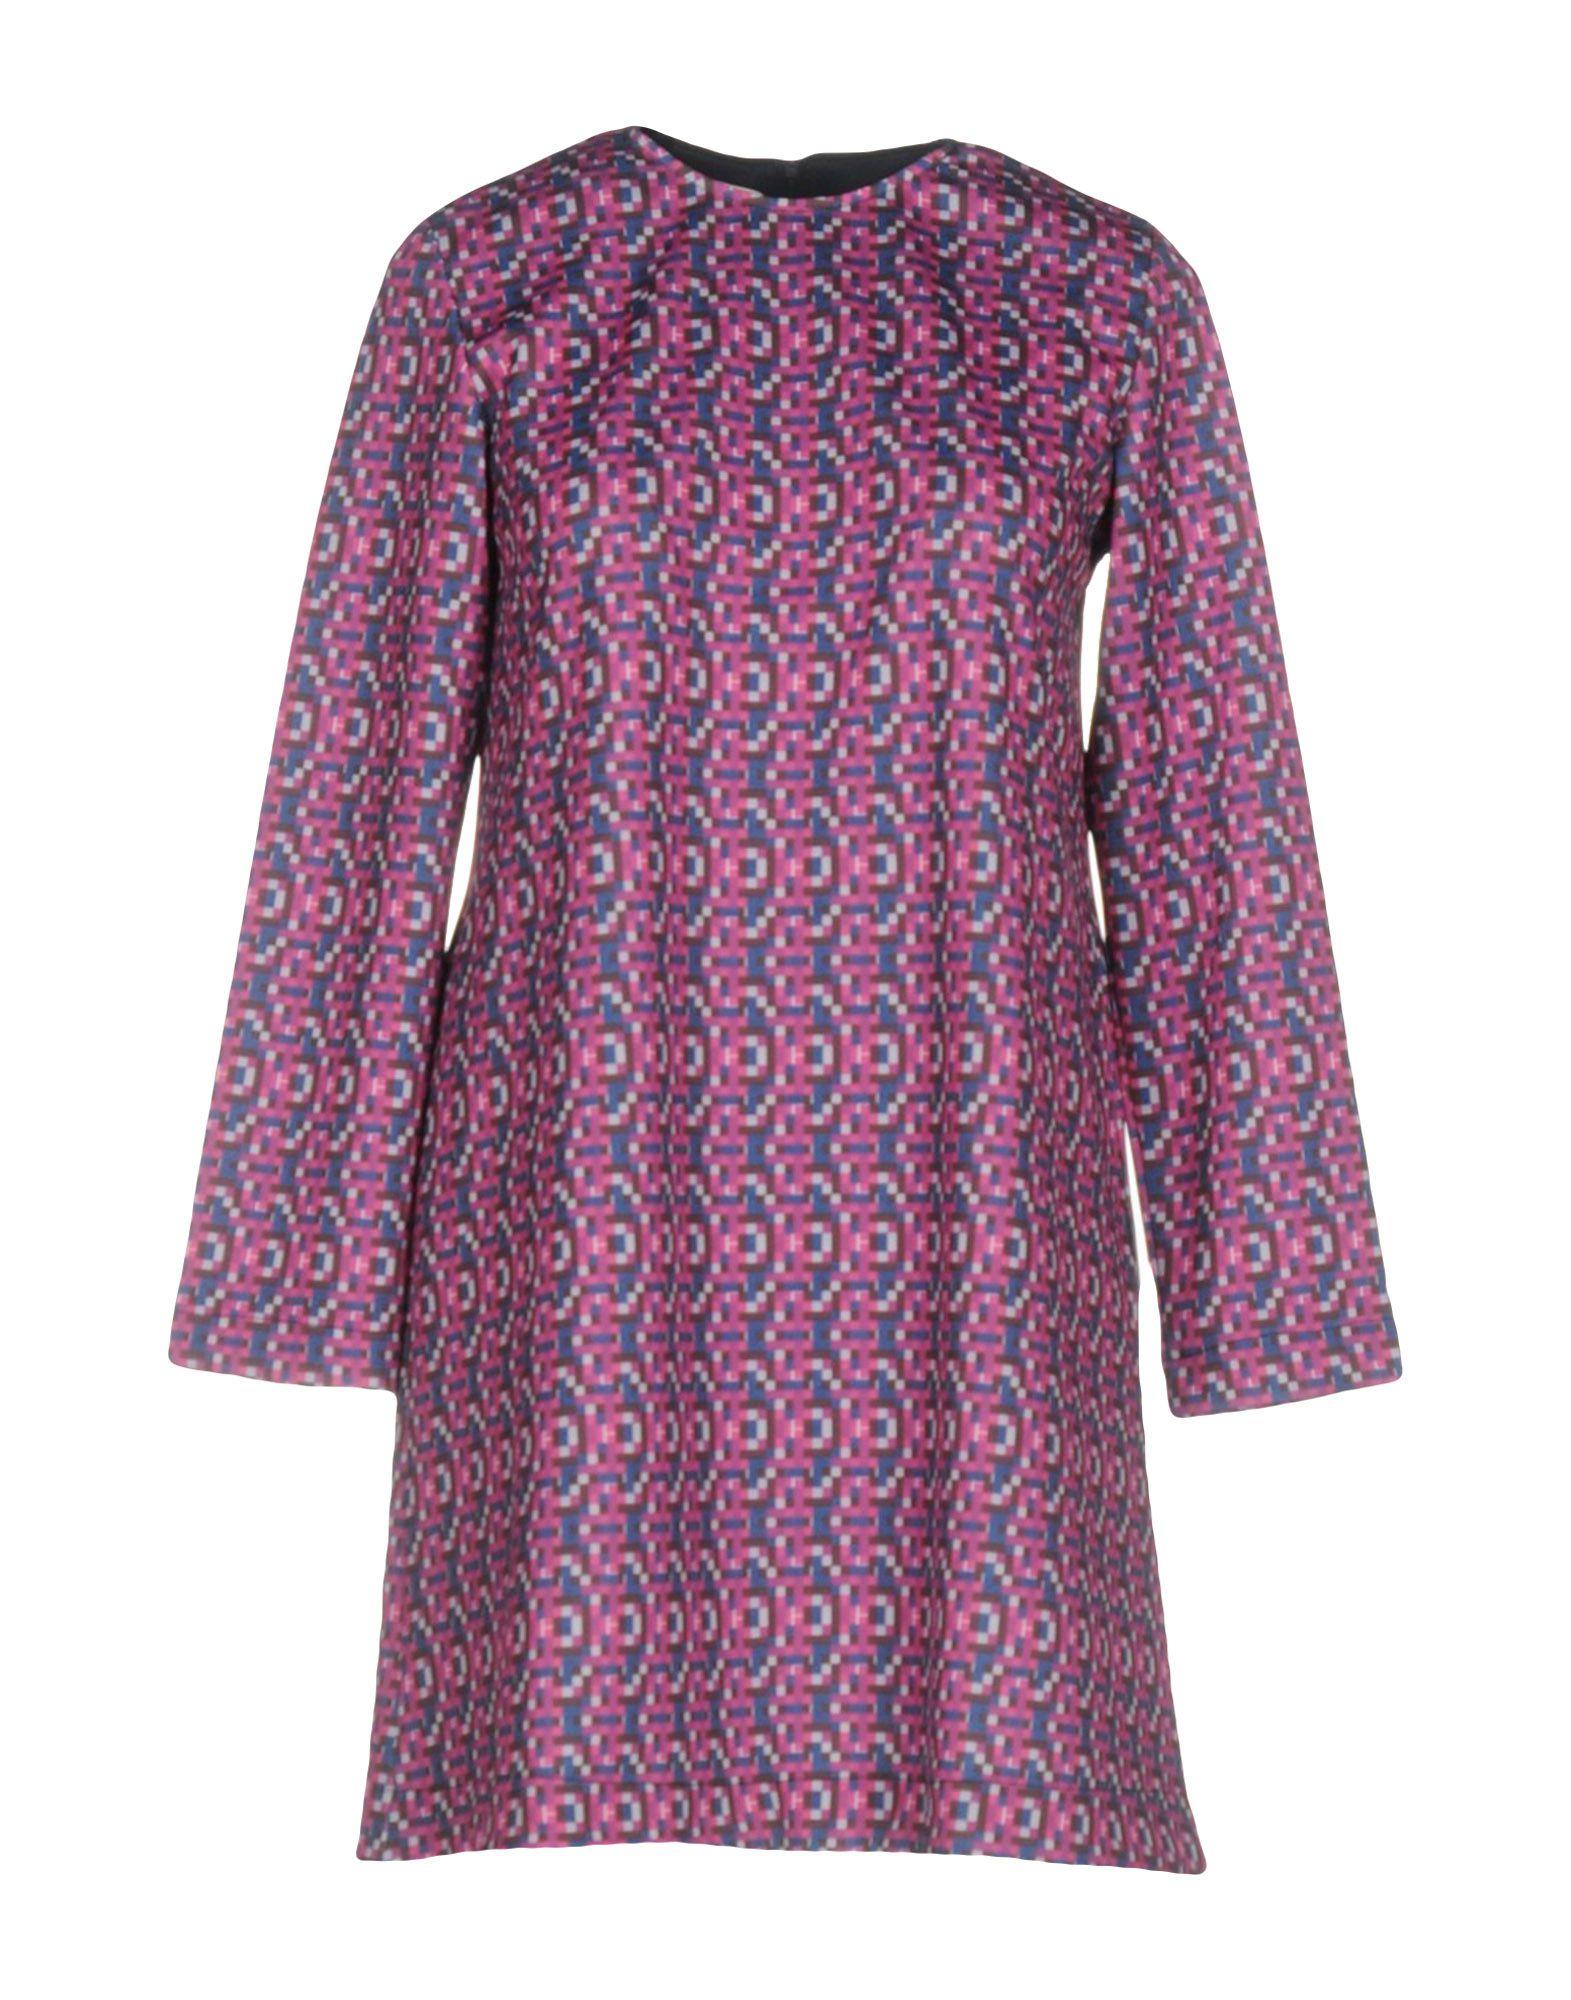 LOU LOU LONDON Короткое платье liberty london короткое платье